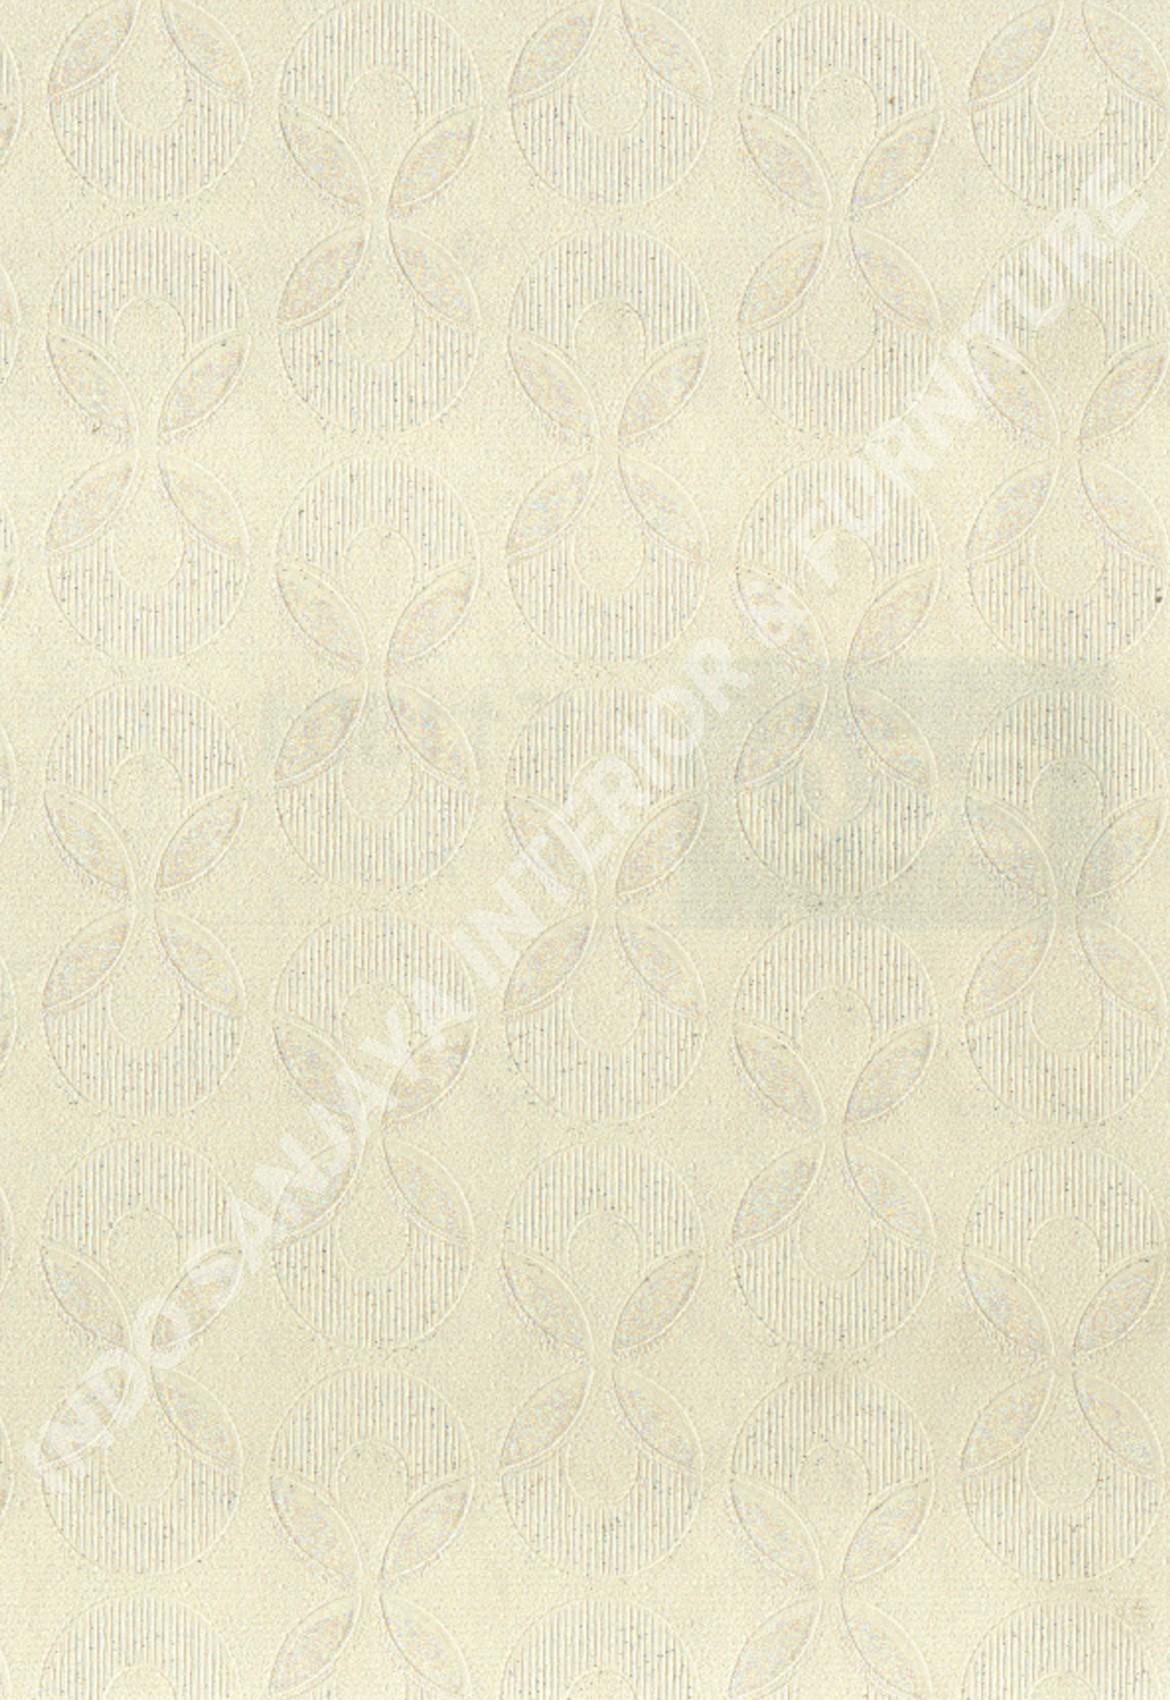 wallpaper   Wallpaper Minimalis Polos E11301:E11301 corak  warna